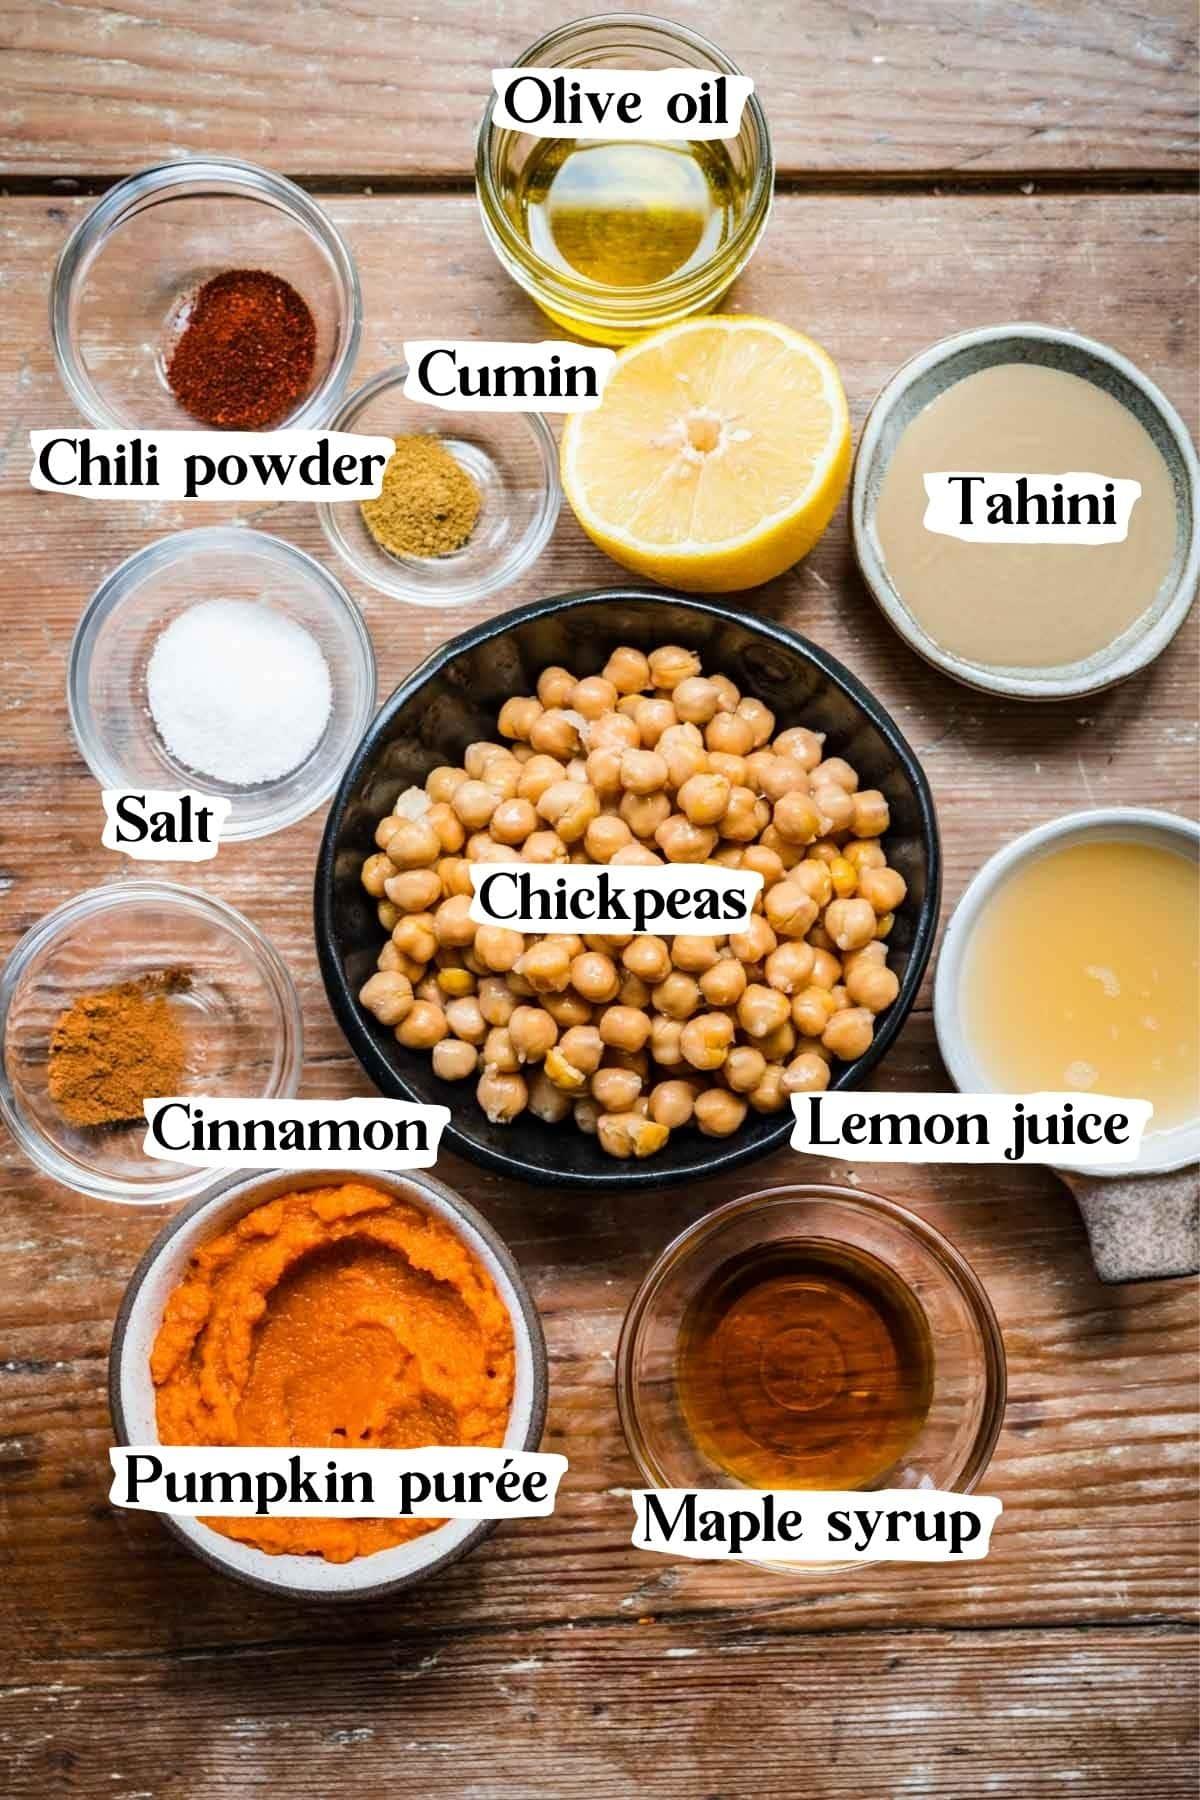 Overhead view of pumpkin hummus ingredients including chickpeas, tahini, and pumpkin puree.